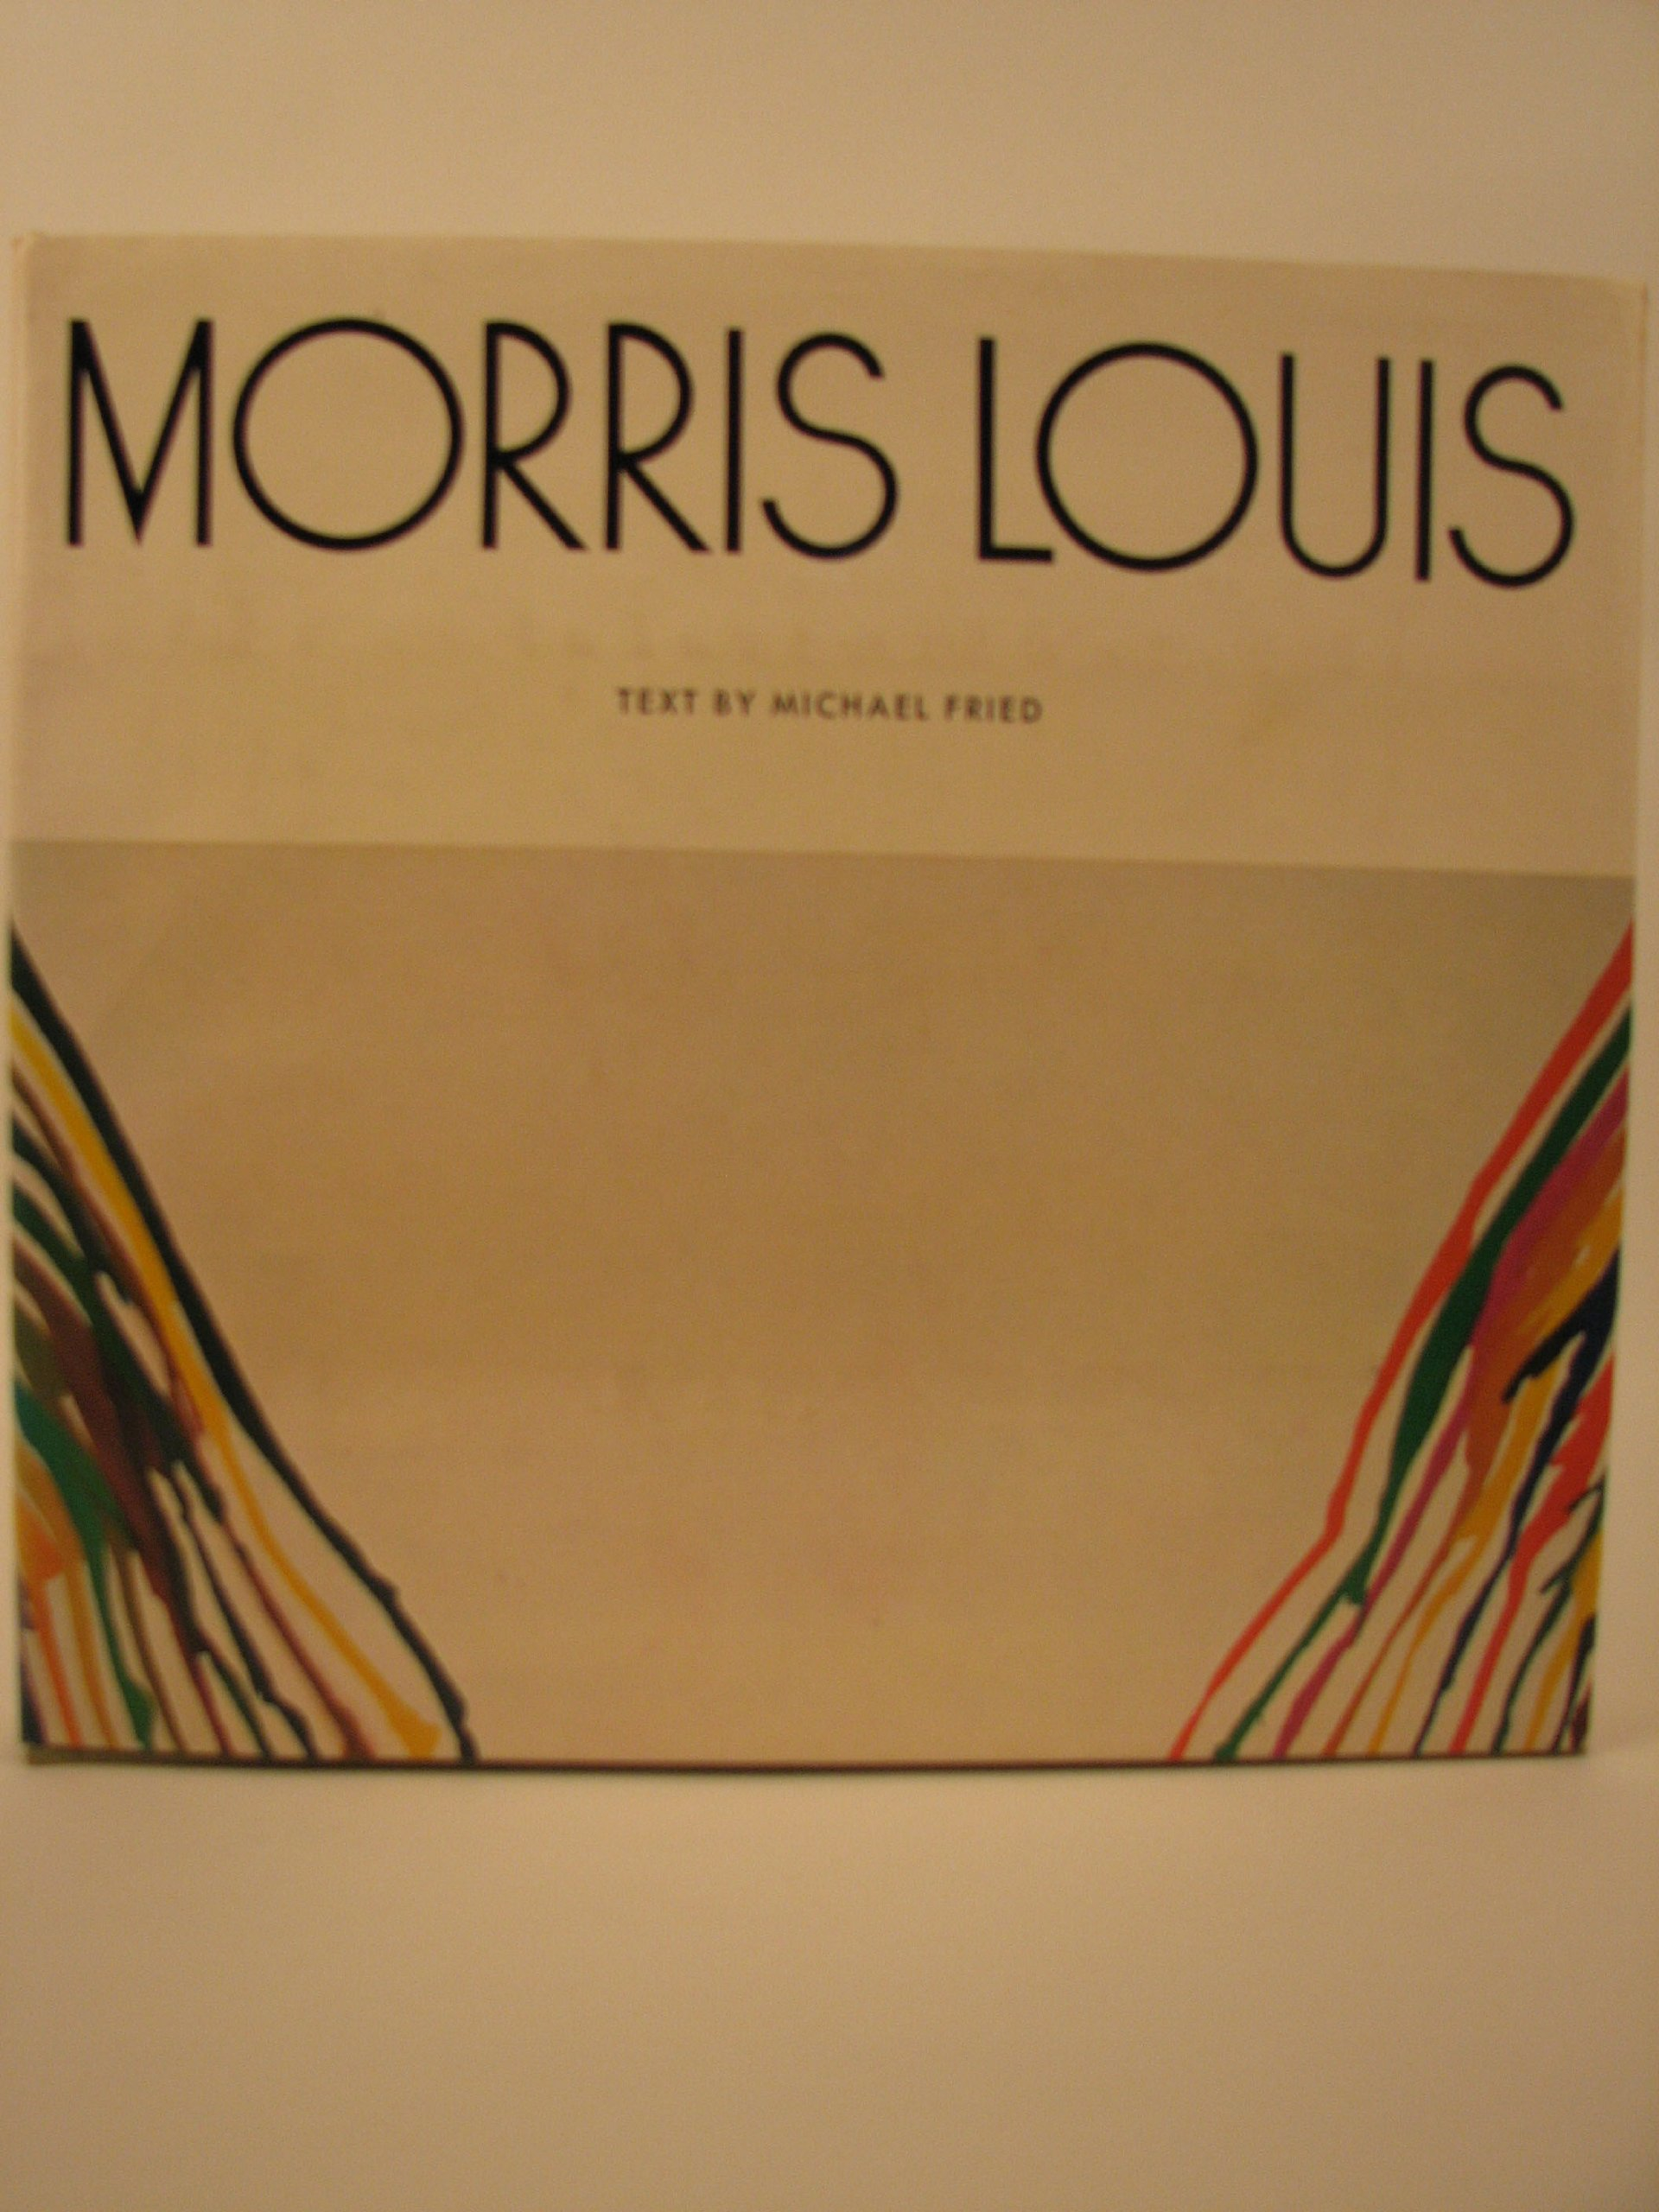 Morris Louis: Morris Louis, Michael Fried: 9780810902503: Amazon: Books